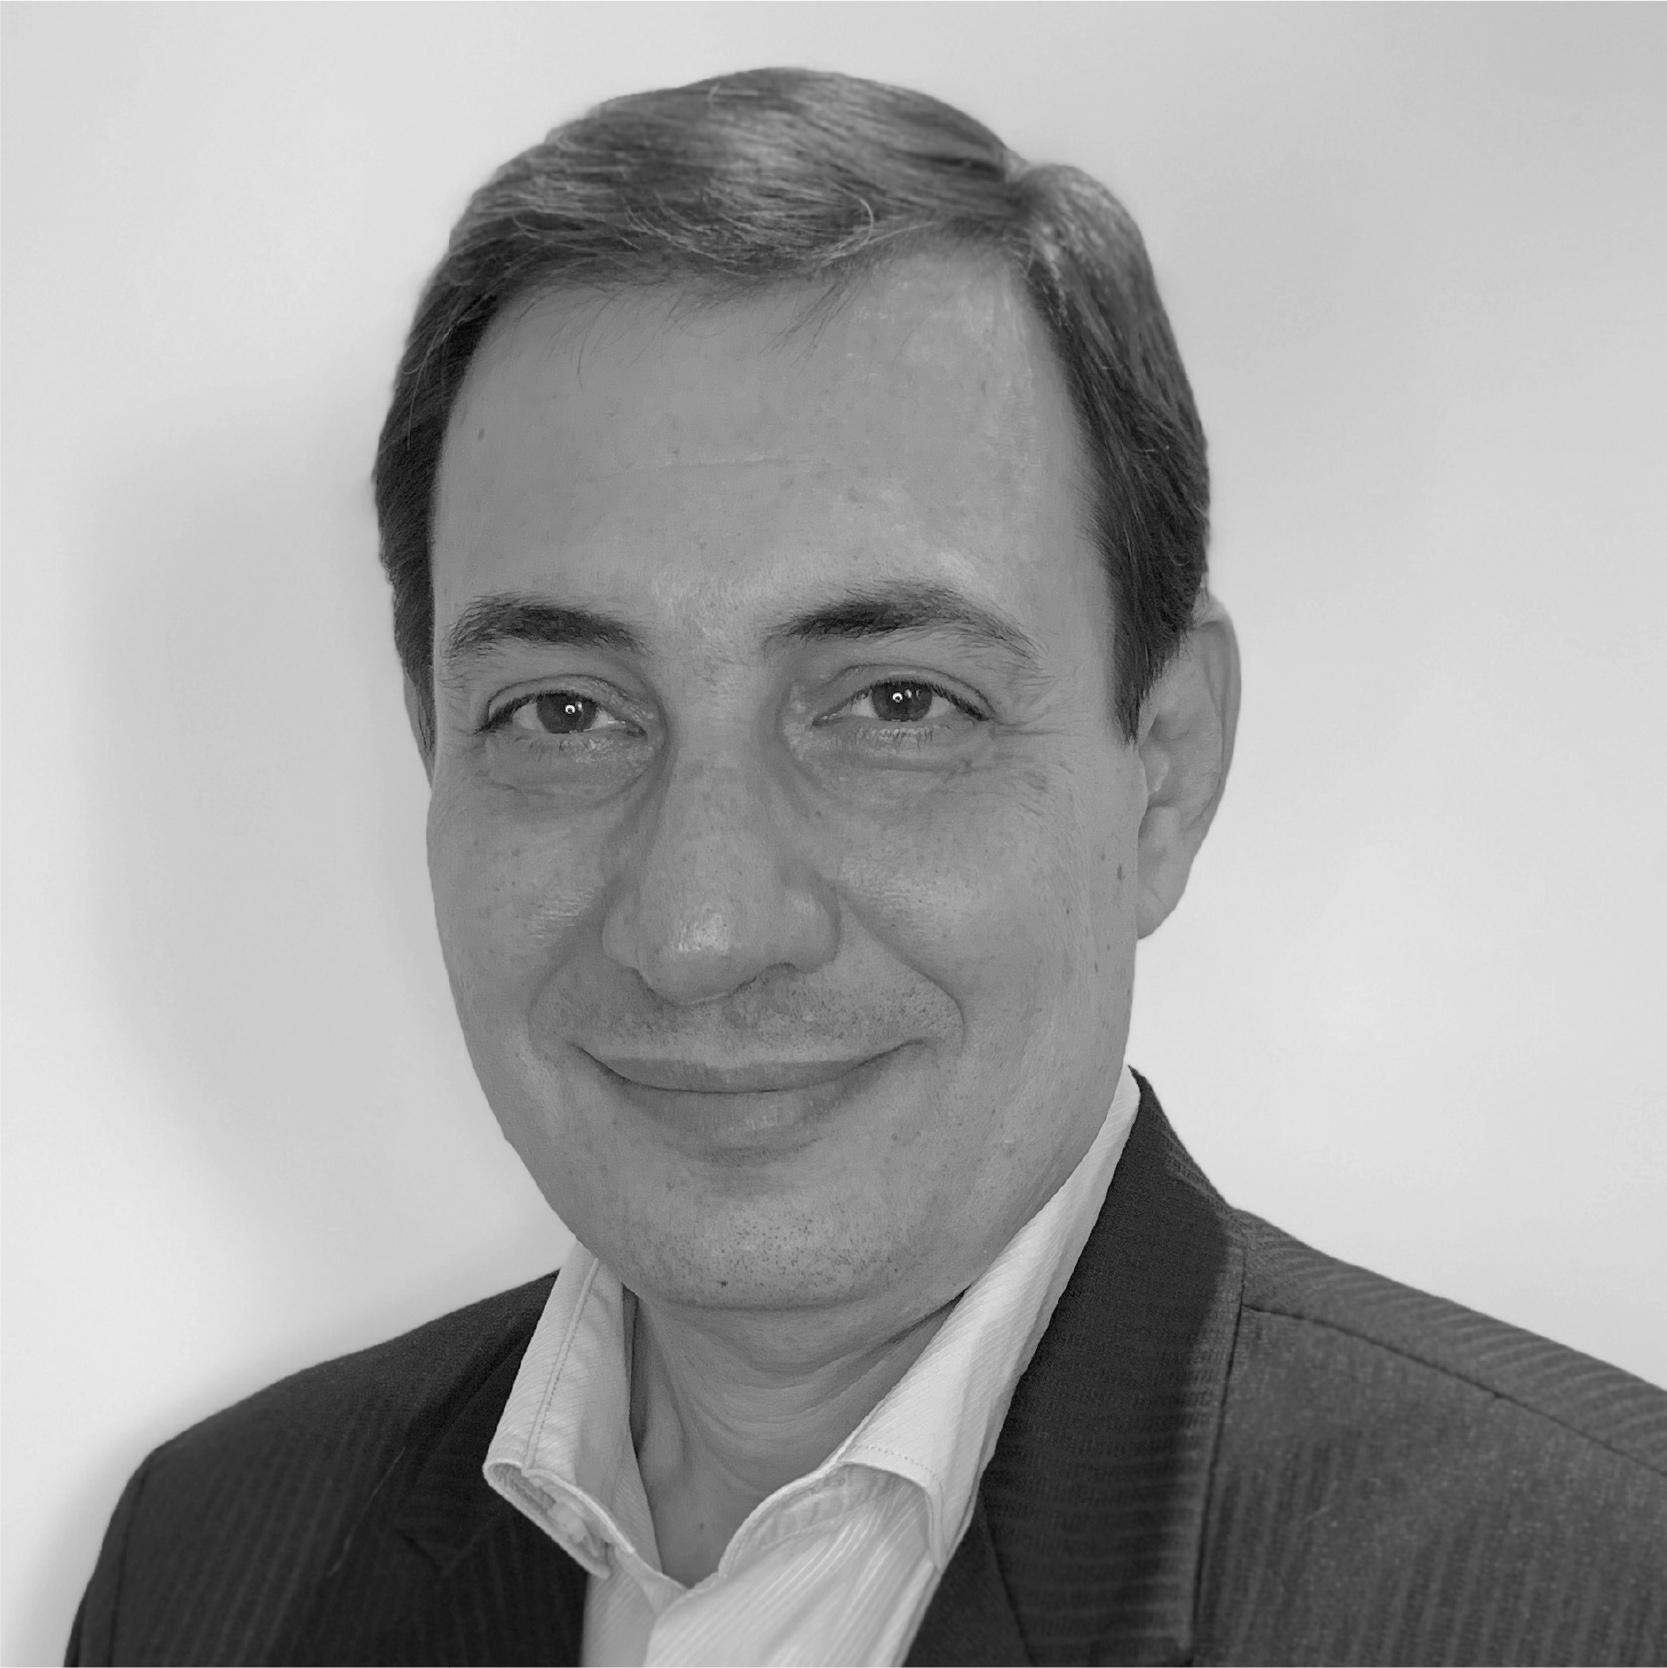 Ricardo Crepaldi